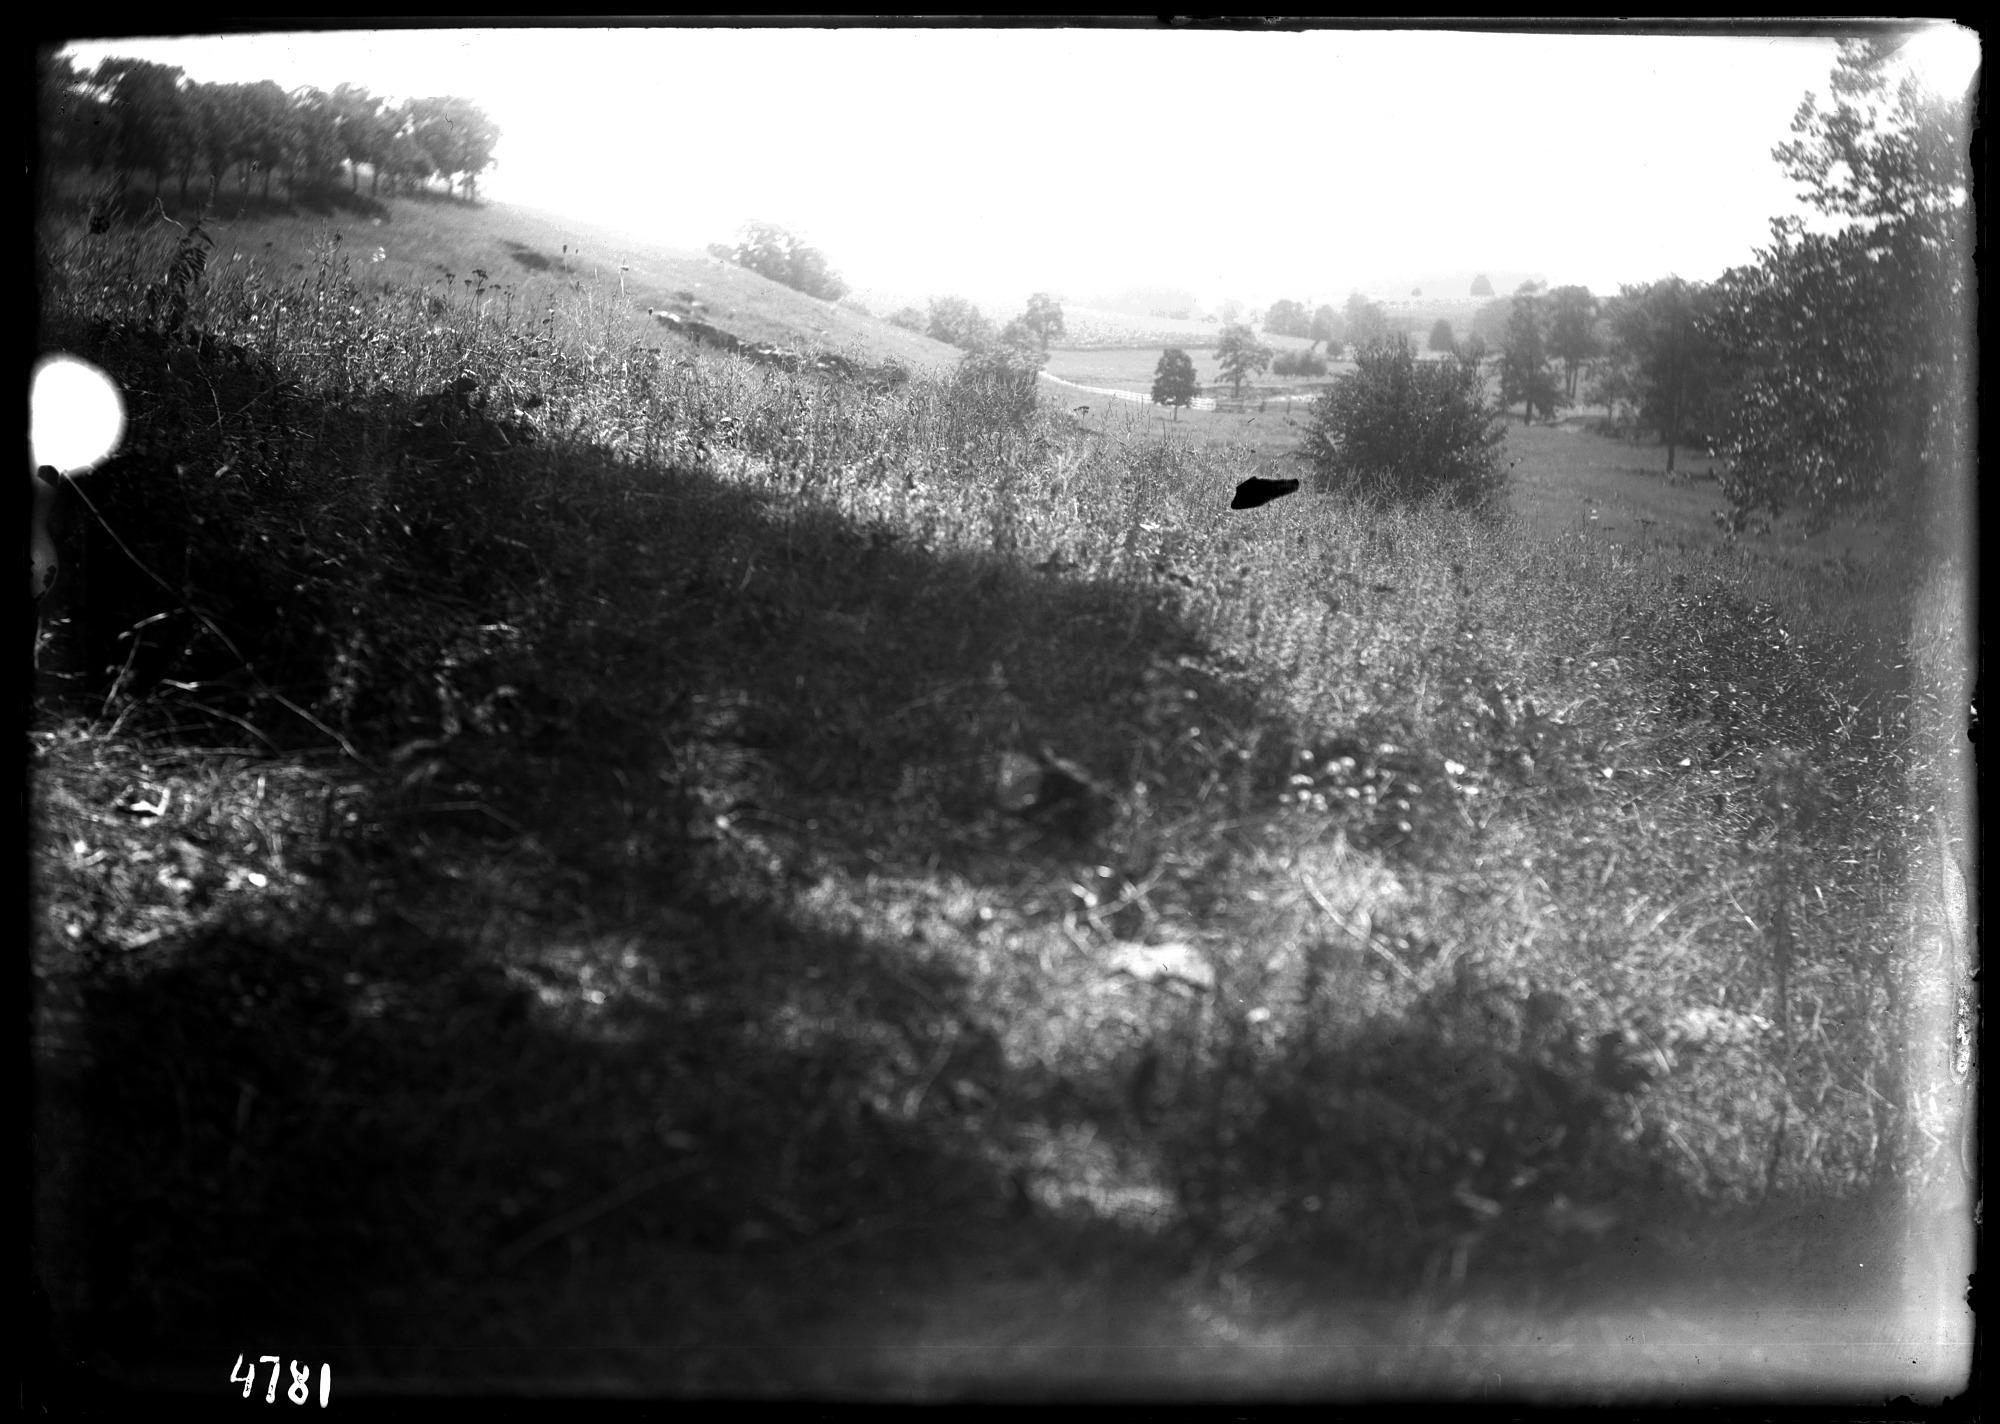 Unidentified Farm, 1880, Smithsonian Institution Archives, SIA Acc. 11-006 [MAH-4781].